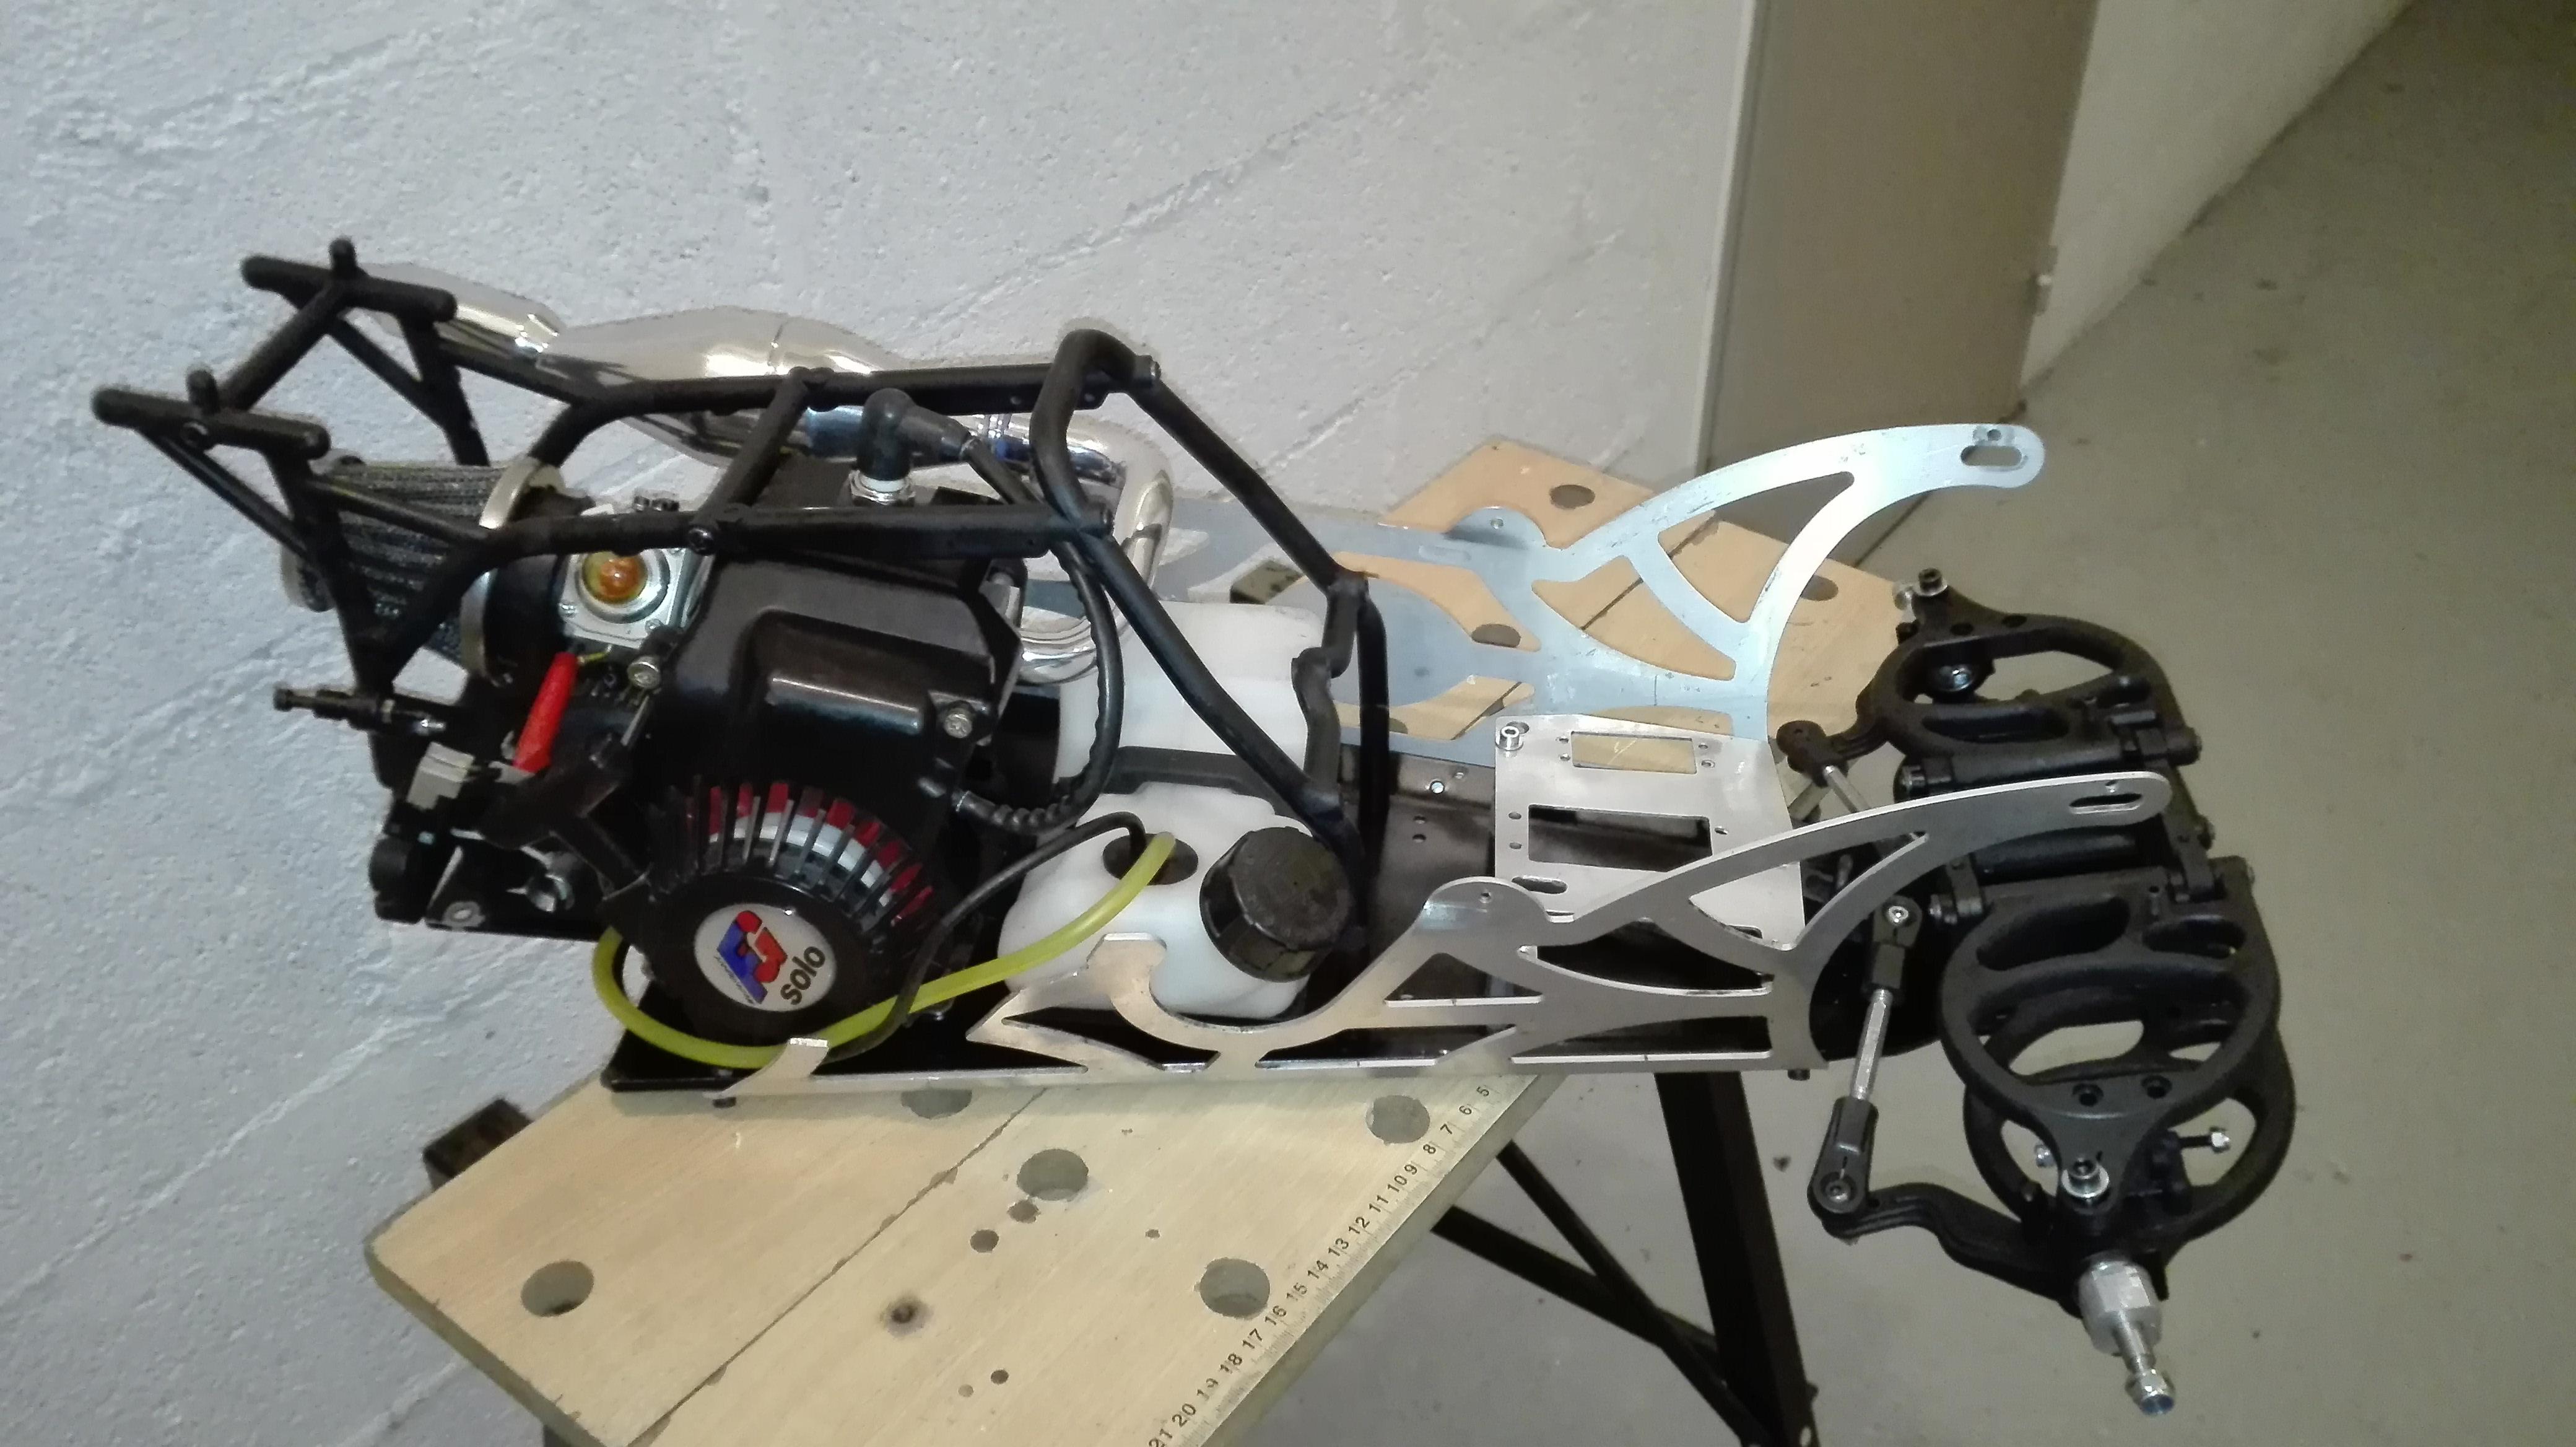 re-montage complet monster truck FG depuis un chassis nu - Page 2 180203080145867279